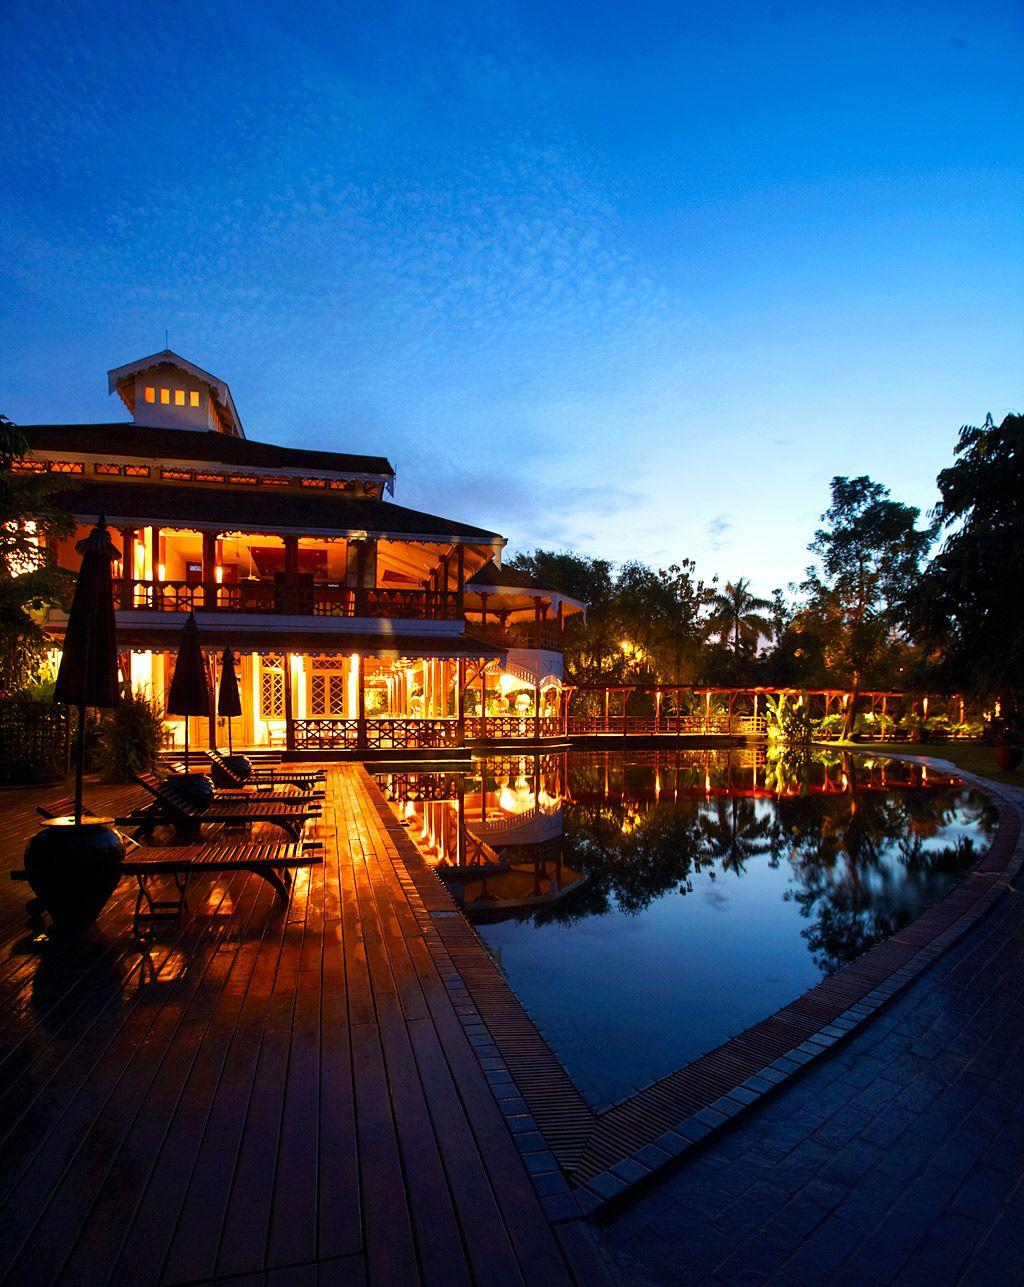 Photos of Burma's Temples, Beaches, Monks and Food - Condé Nast Traveler